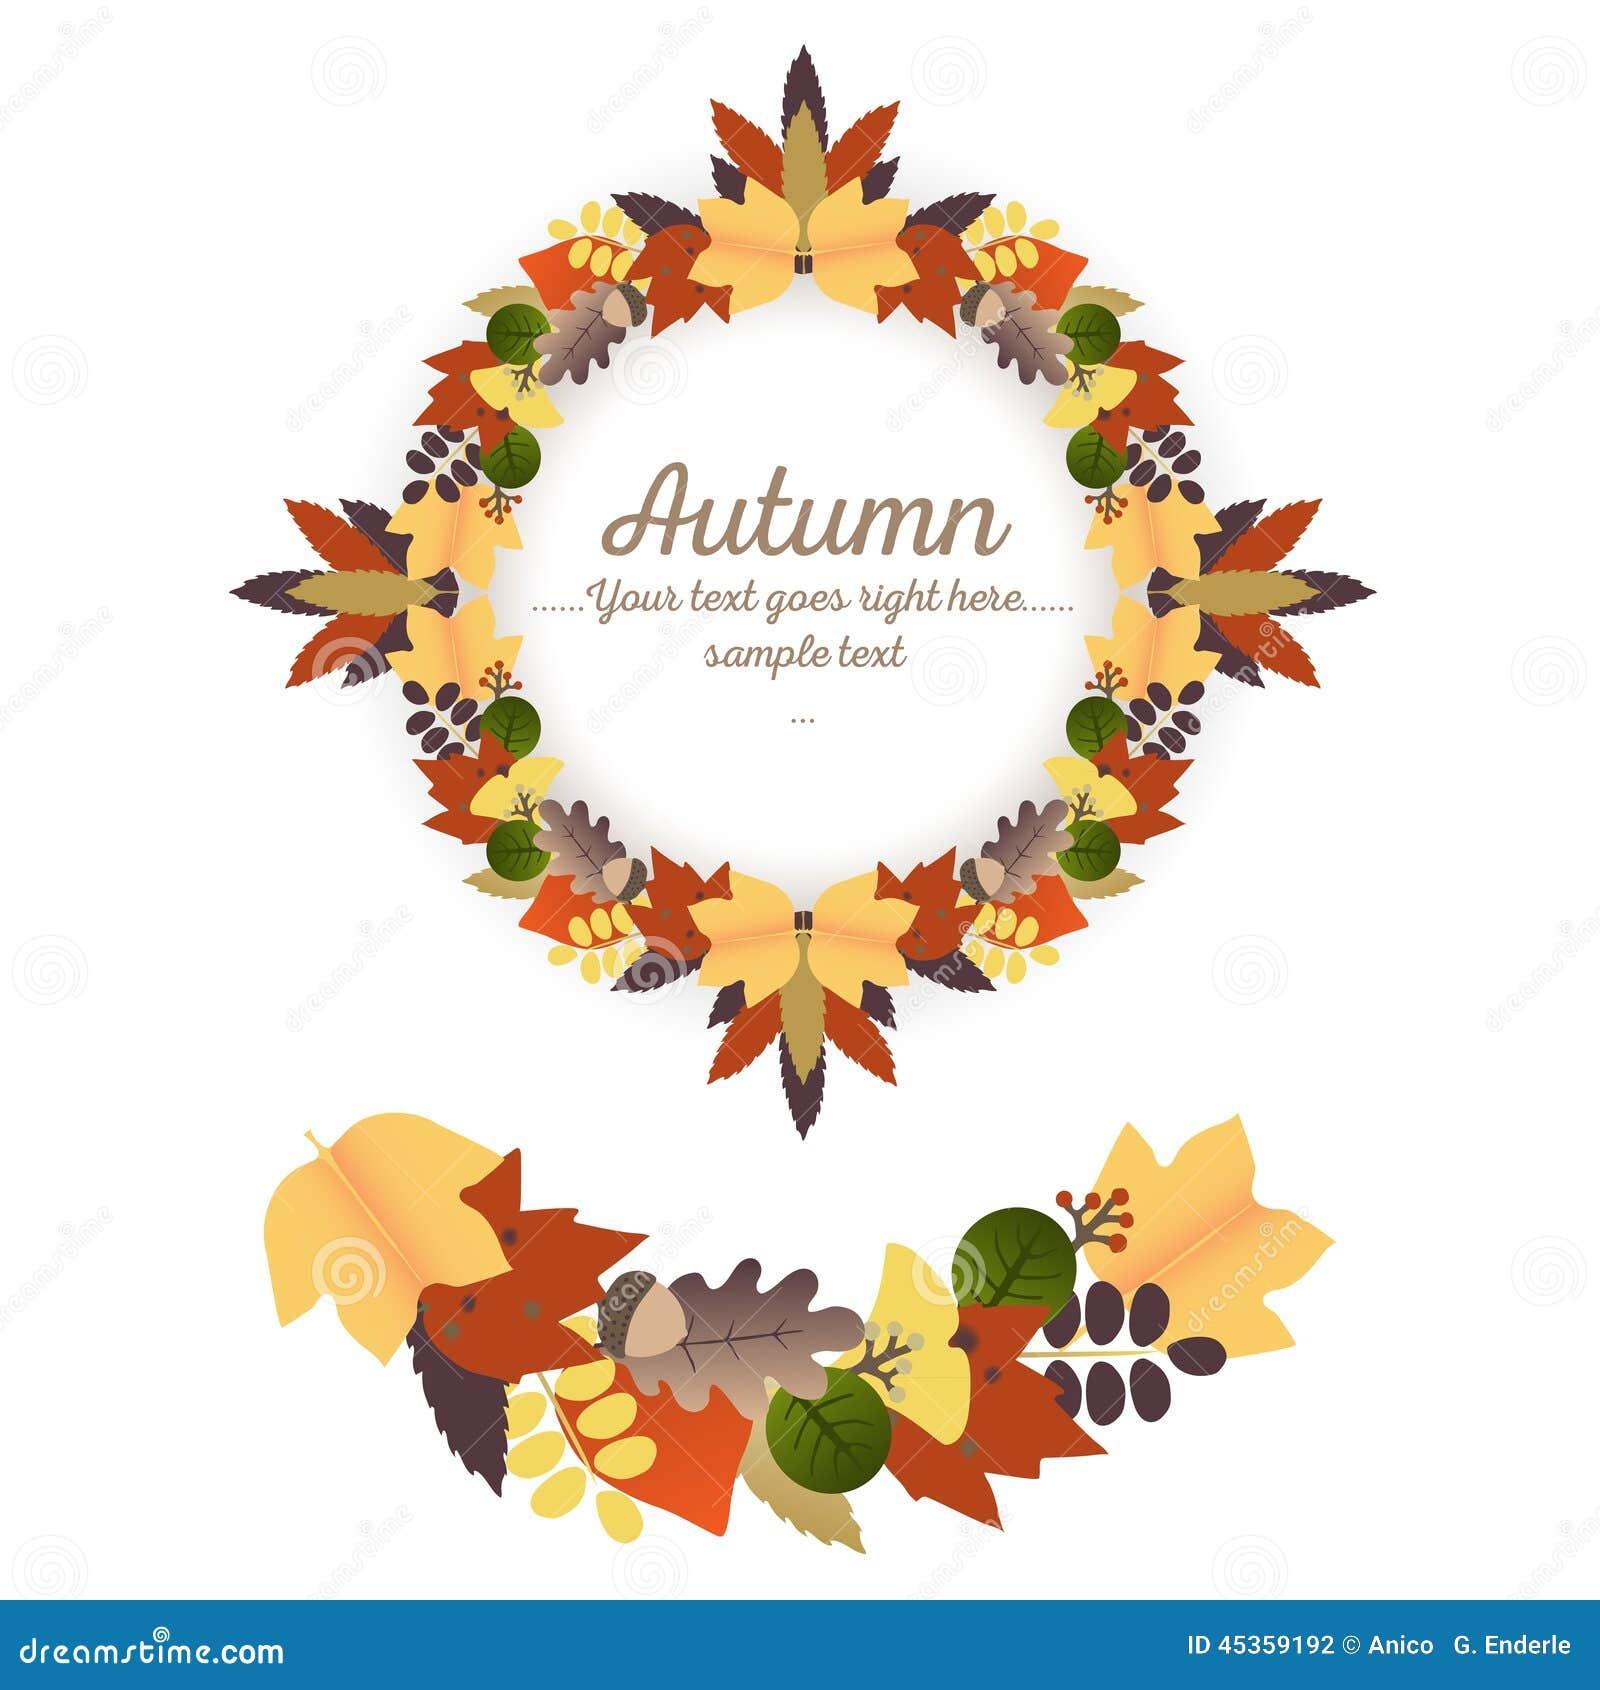 Autumn Ornaments - guirlande et guirlande